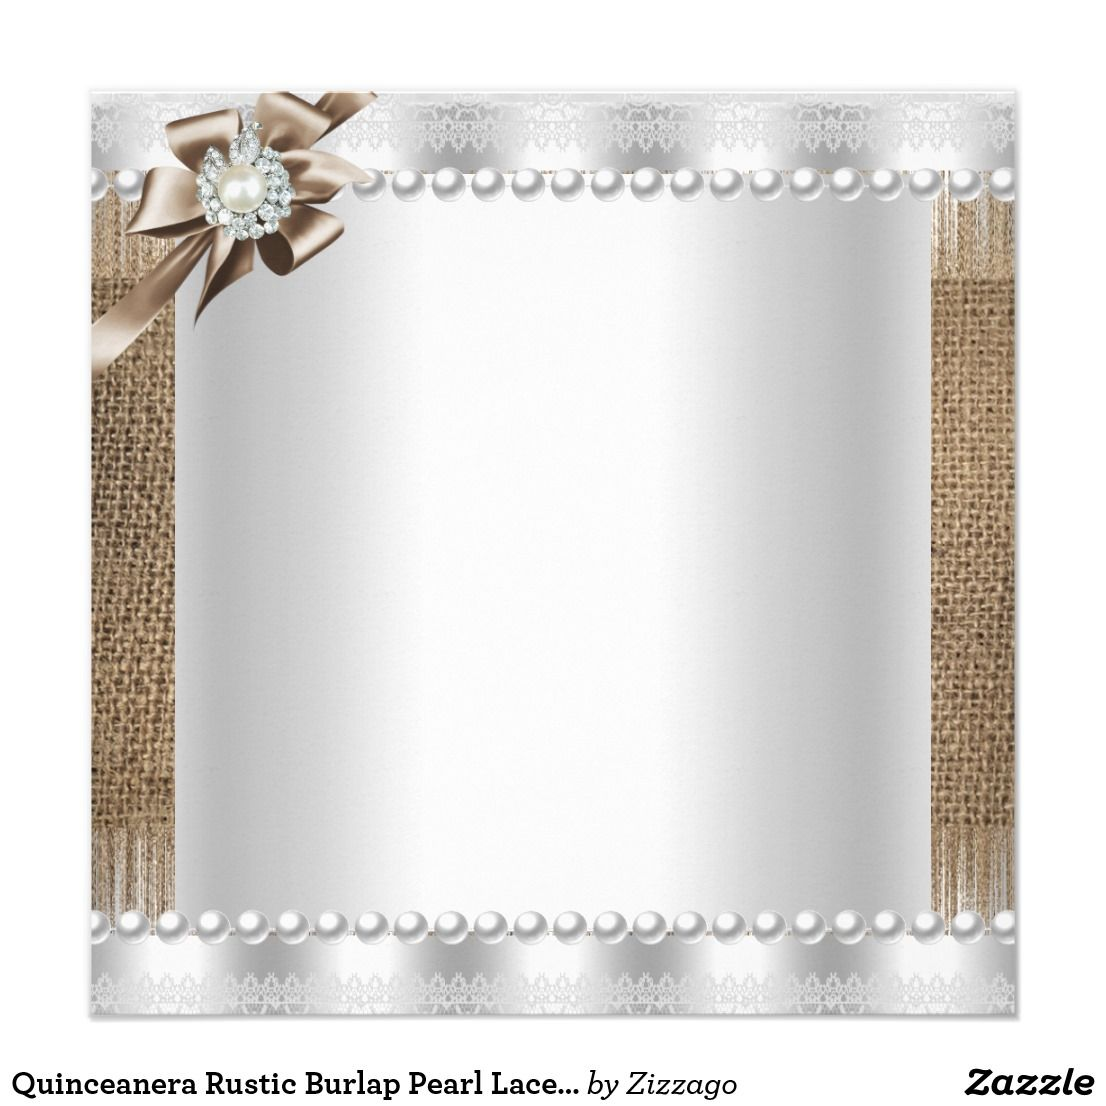 Create Your Own Invitation Zazzle Com Certificate Design Inspiration Invitations Flower Frame